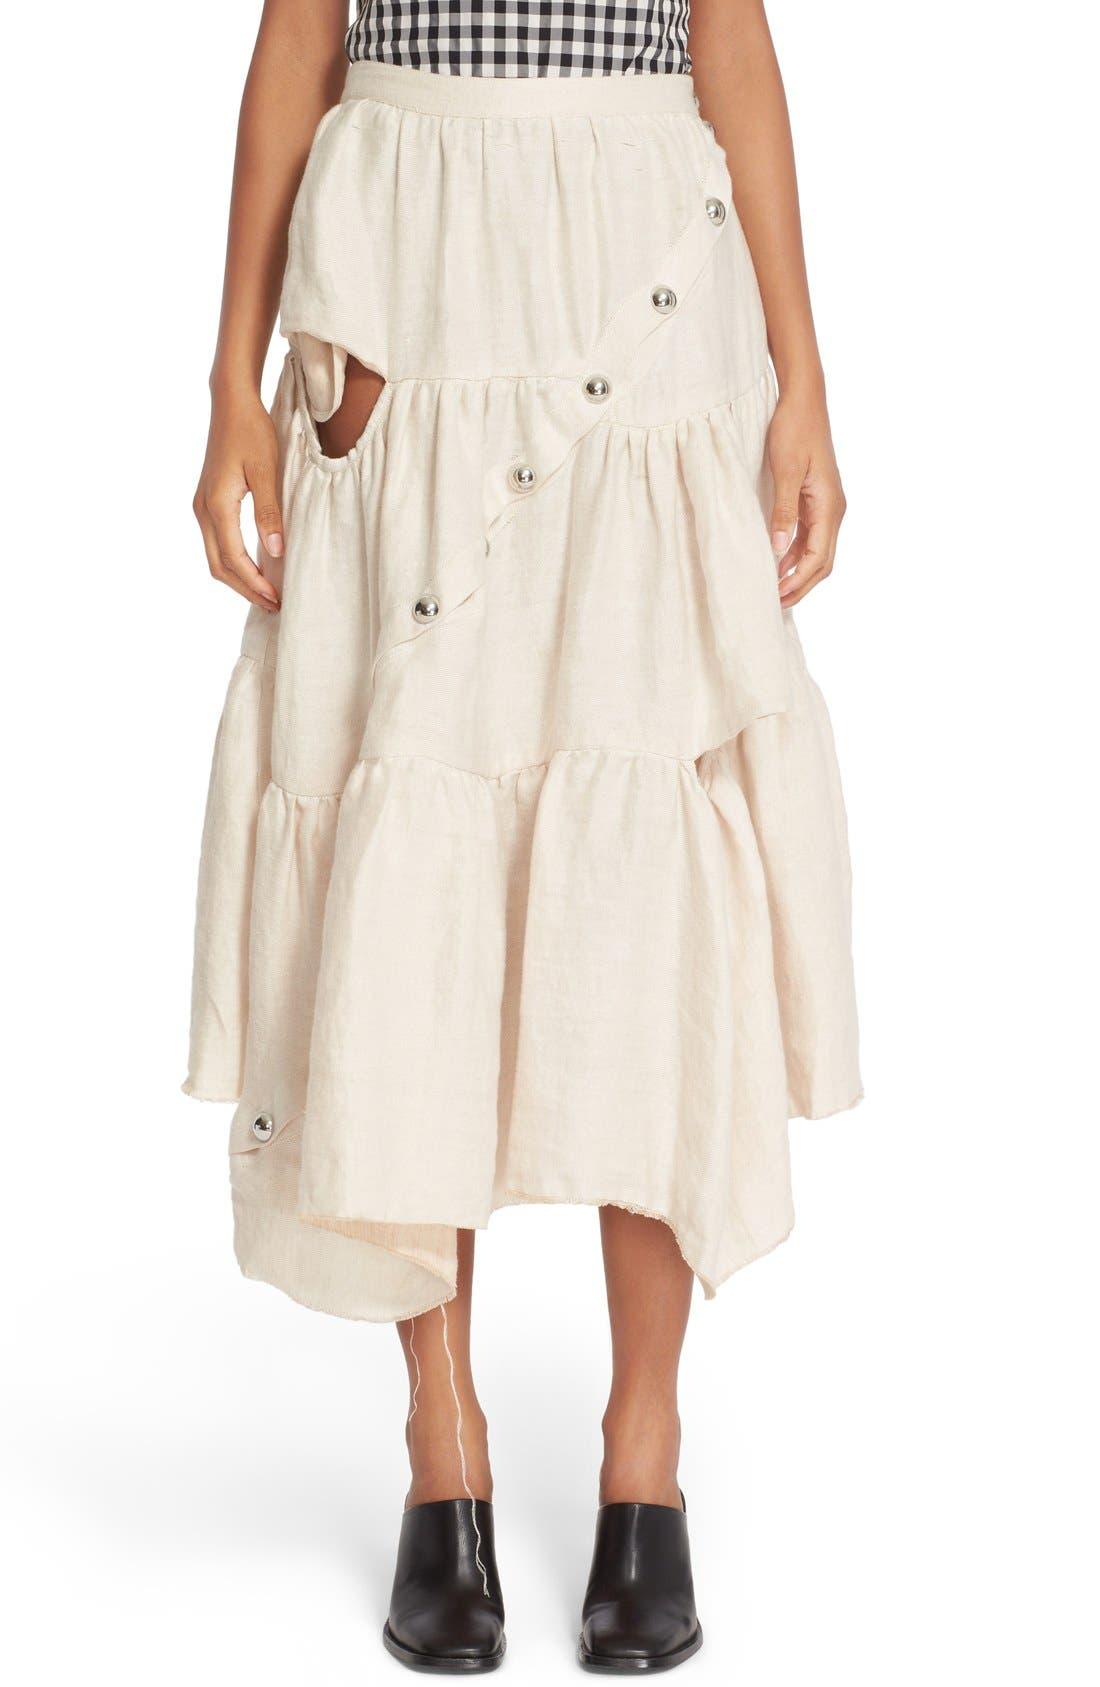 MARQUES'ALMEIDA Marques'Almeida Diagonal Snap Tiered Linen Skirt